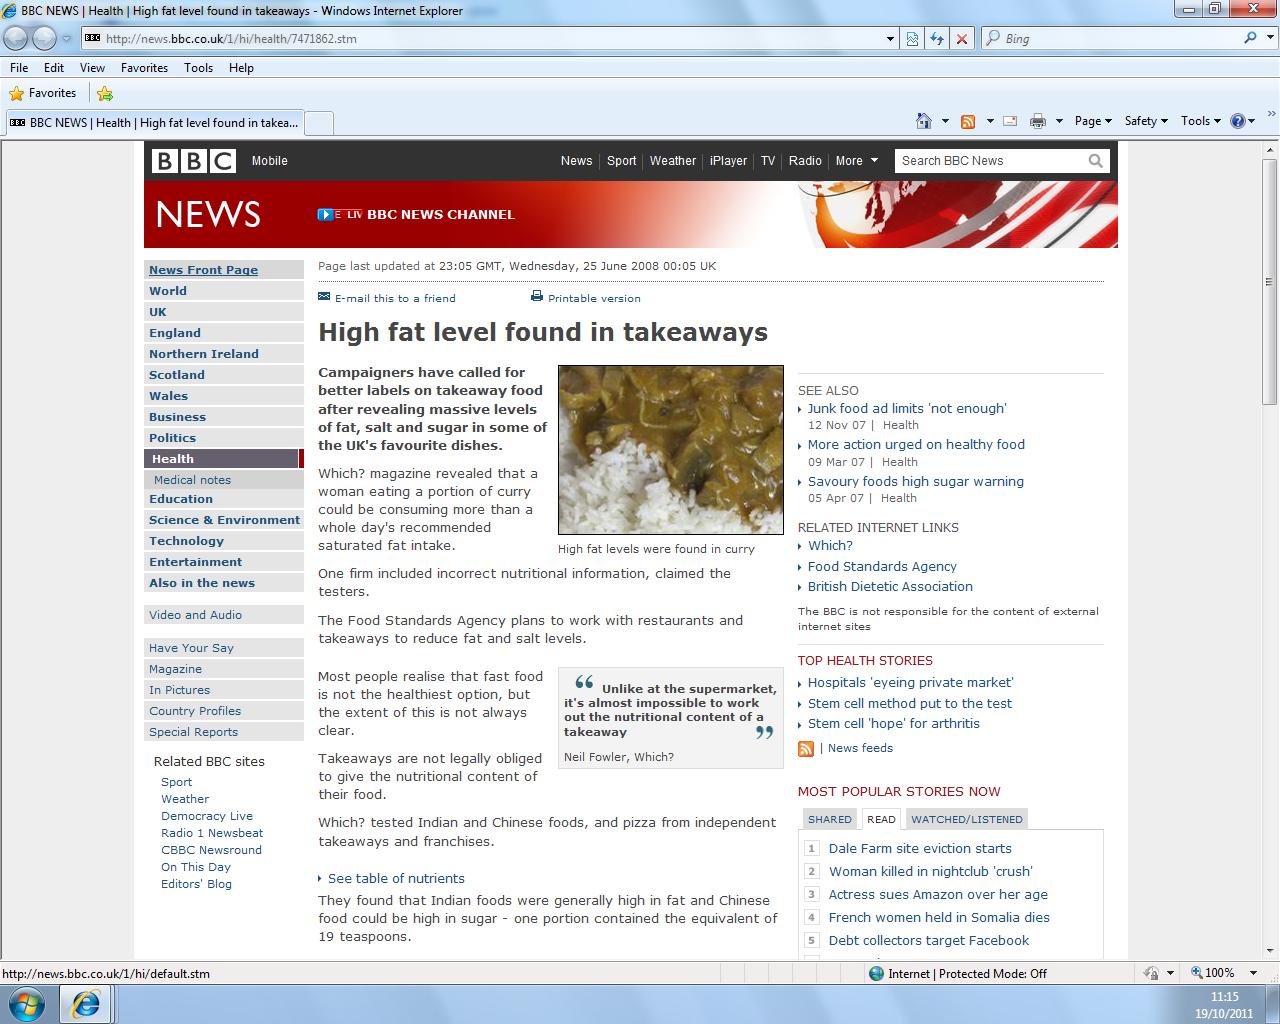 bbc website analysis Dauchet l, amouyel p, hercberg s, dallongeville j fruit and vegetable  consumption and risk of coronary heart disease: a meta-analysis of cohort  studies.